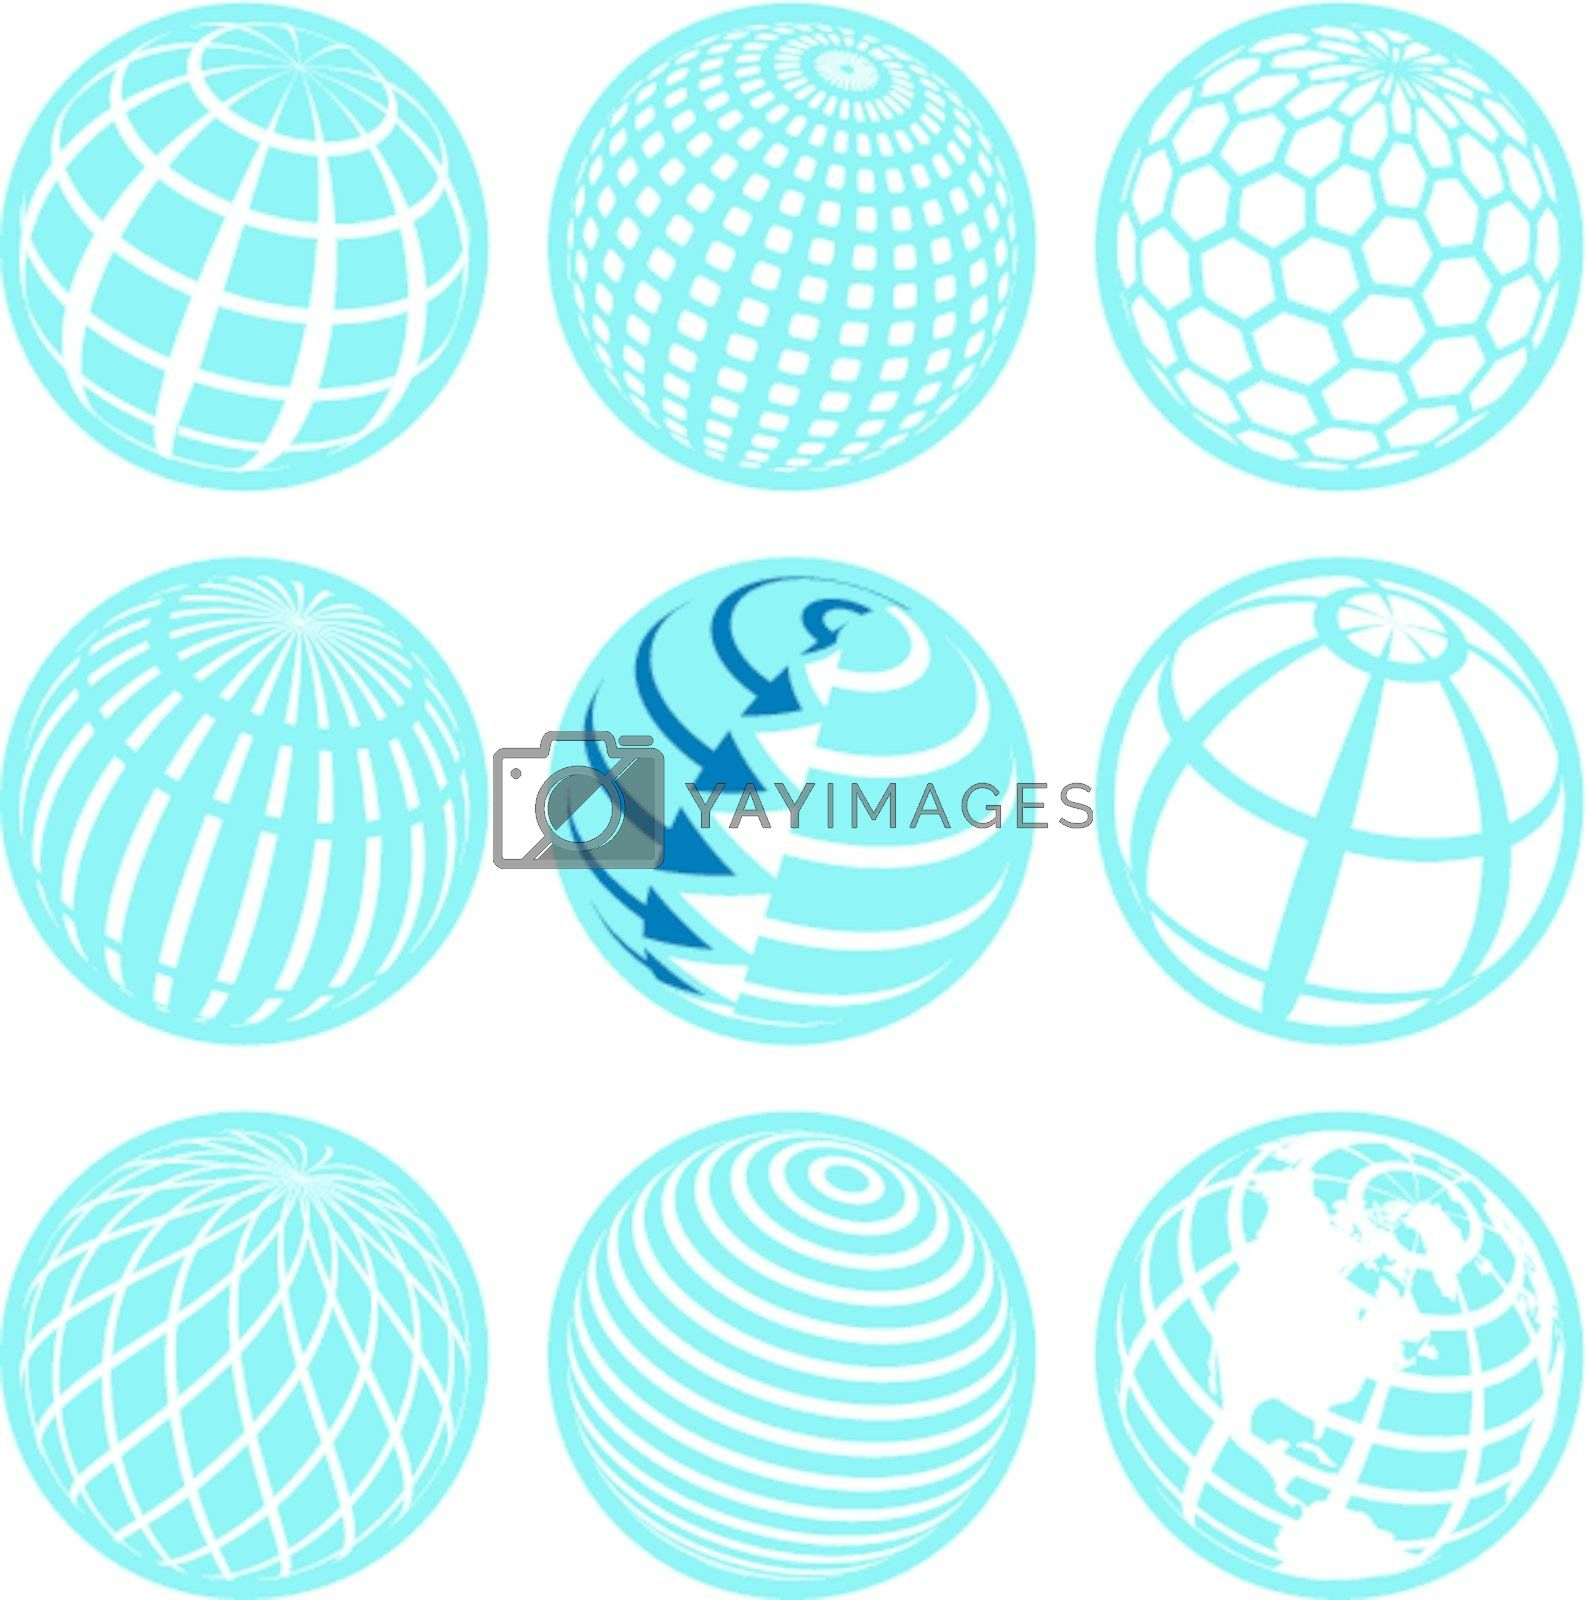 illustration, nine blue symbols of the planet on white background